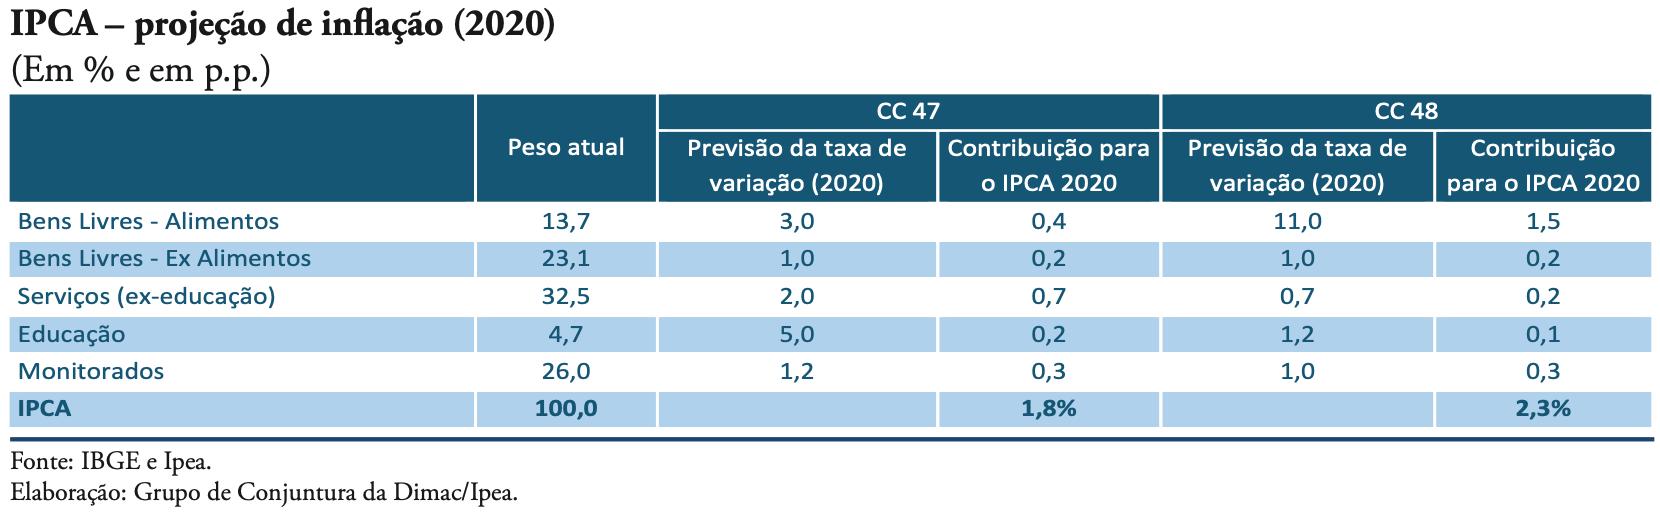 201001_cc_48_inflacao_tabela